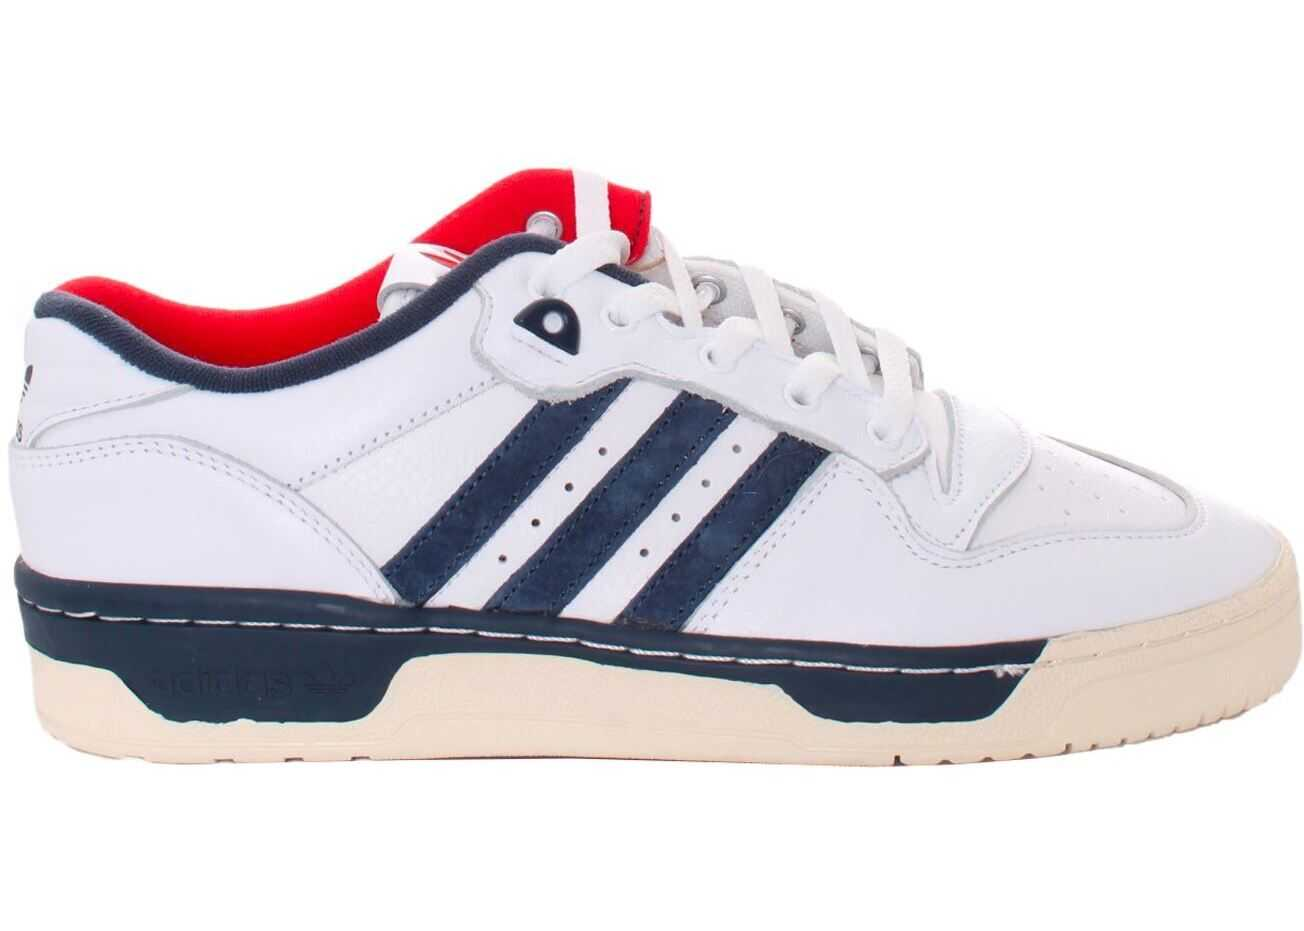 adidas Originals Rivalry Low Premium Sneakers In White FY8031 White imagine b-mall.ro